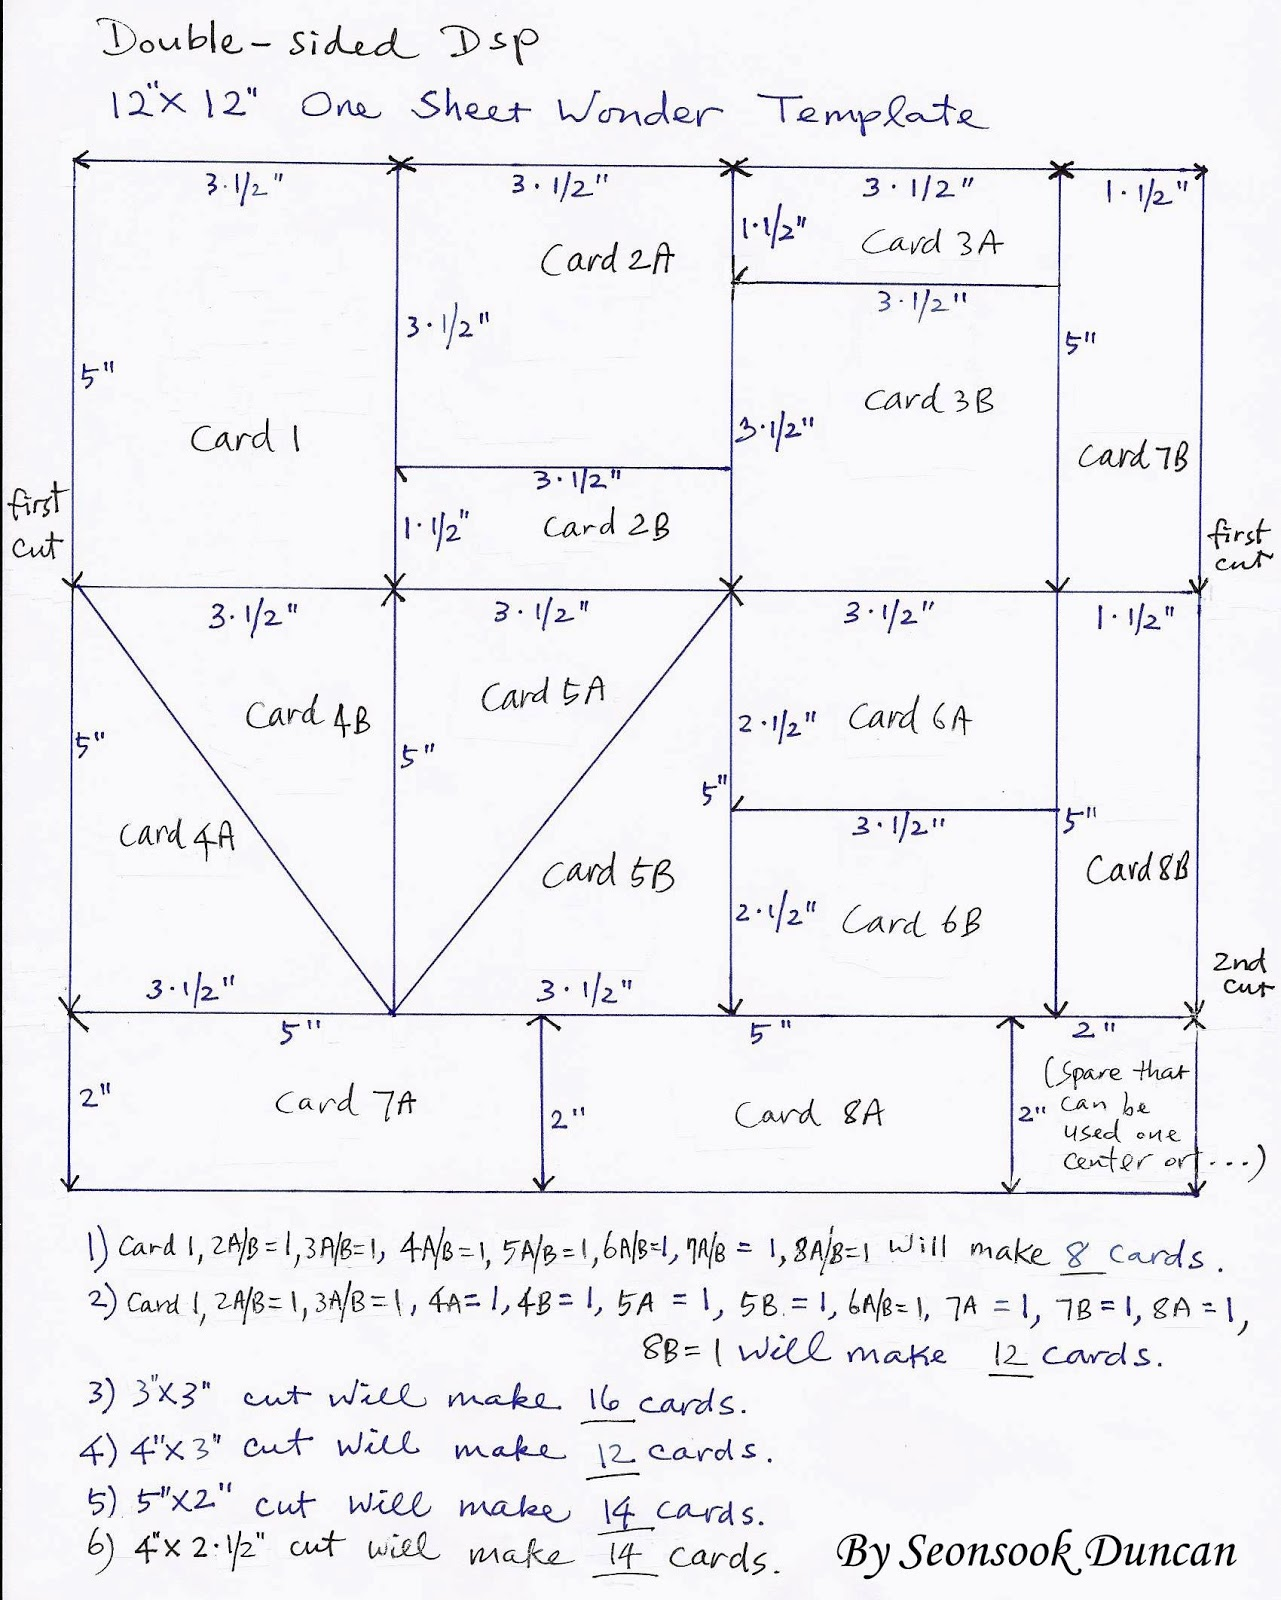 Create with Seongsook: One Sheet Wonder Template and ... - photo#1